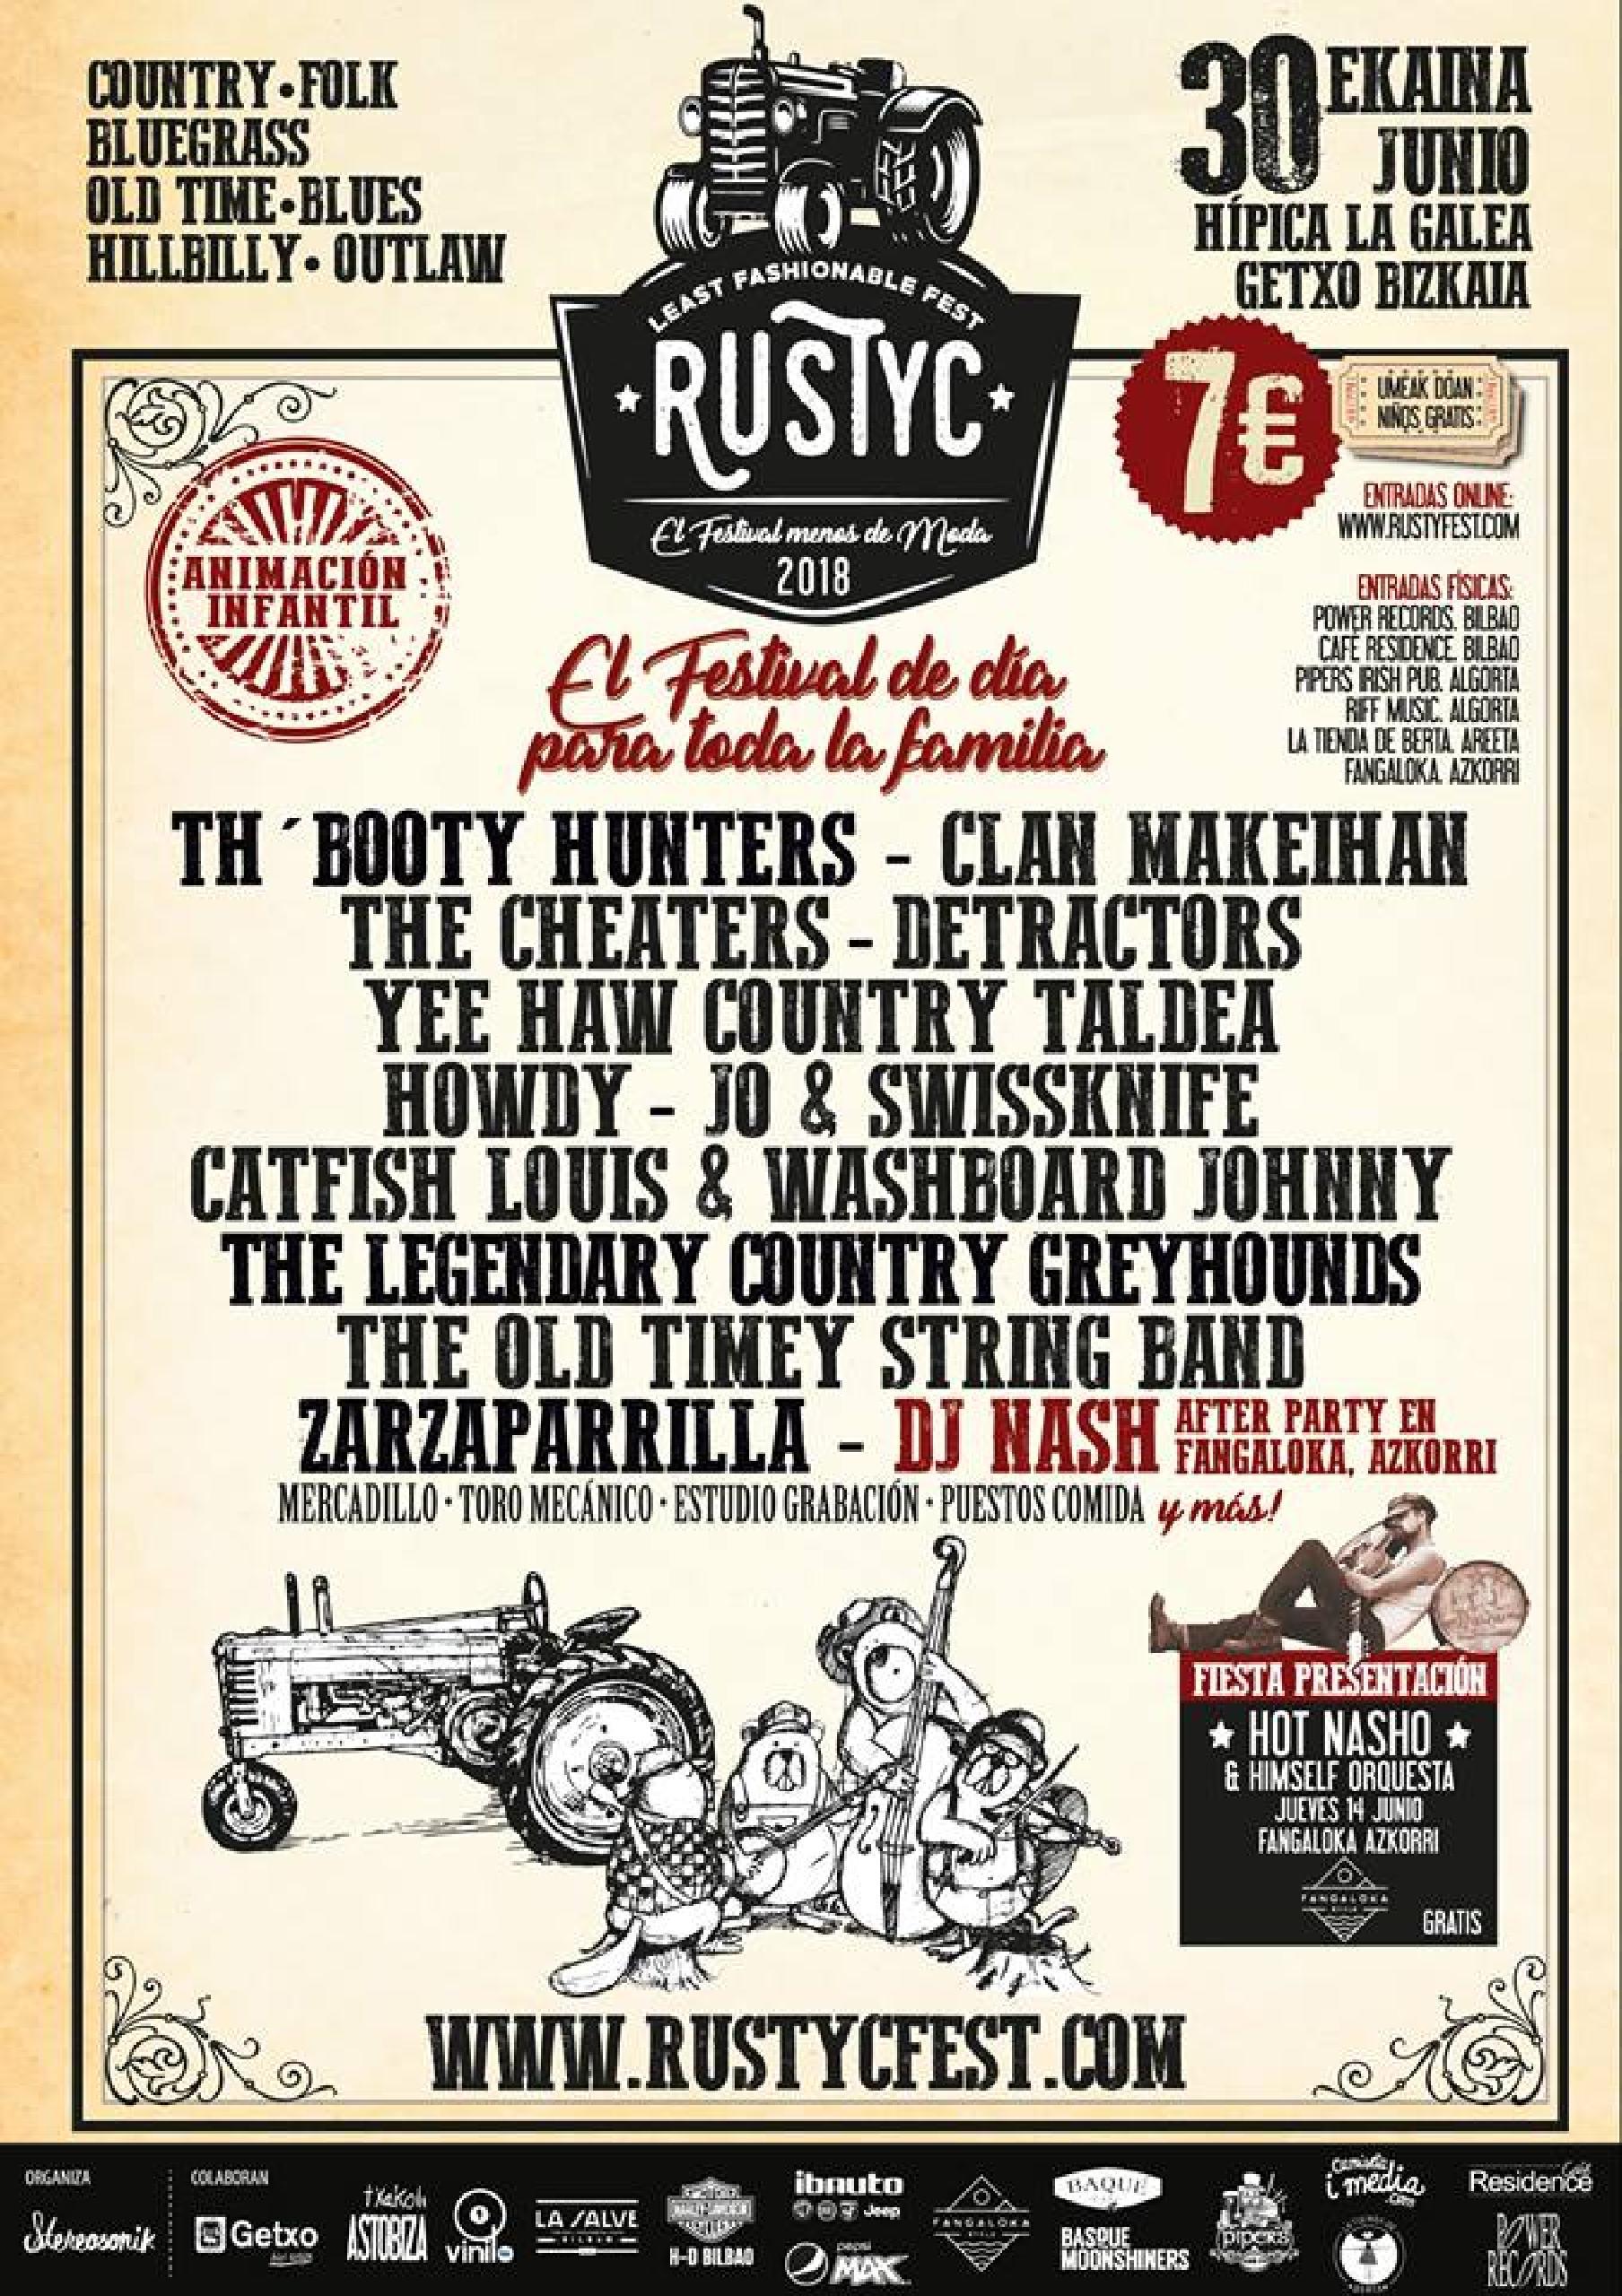 Foto del cartel del Rustyc Music Fest 2018